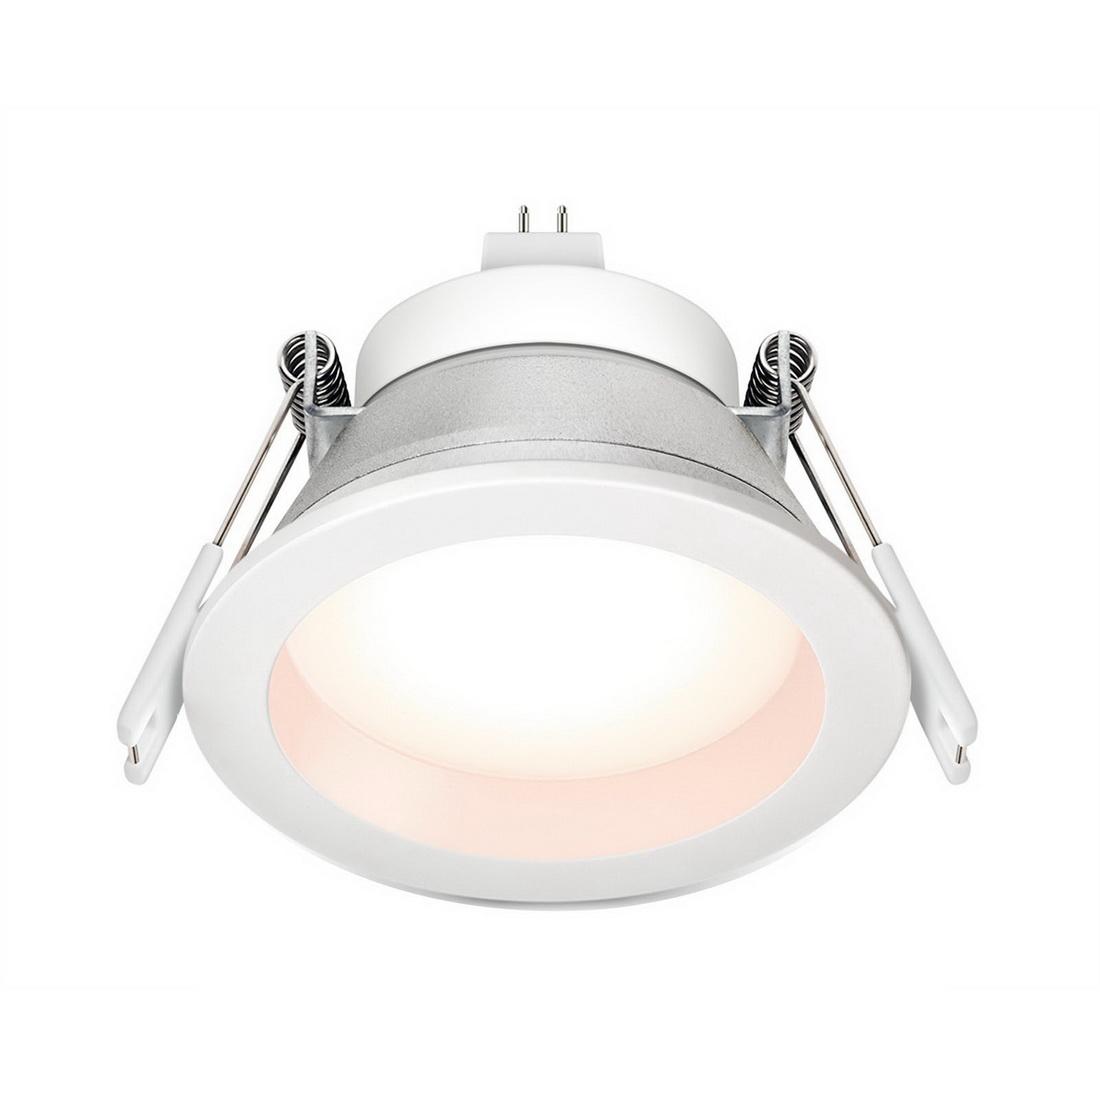 MR16 Retrofit 70mm LED 7W Downlight Cool White